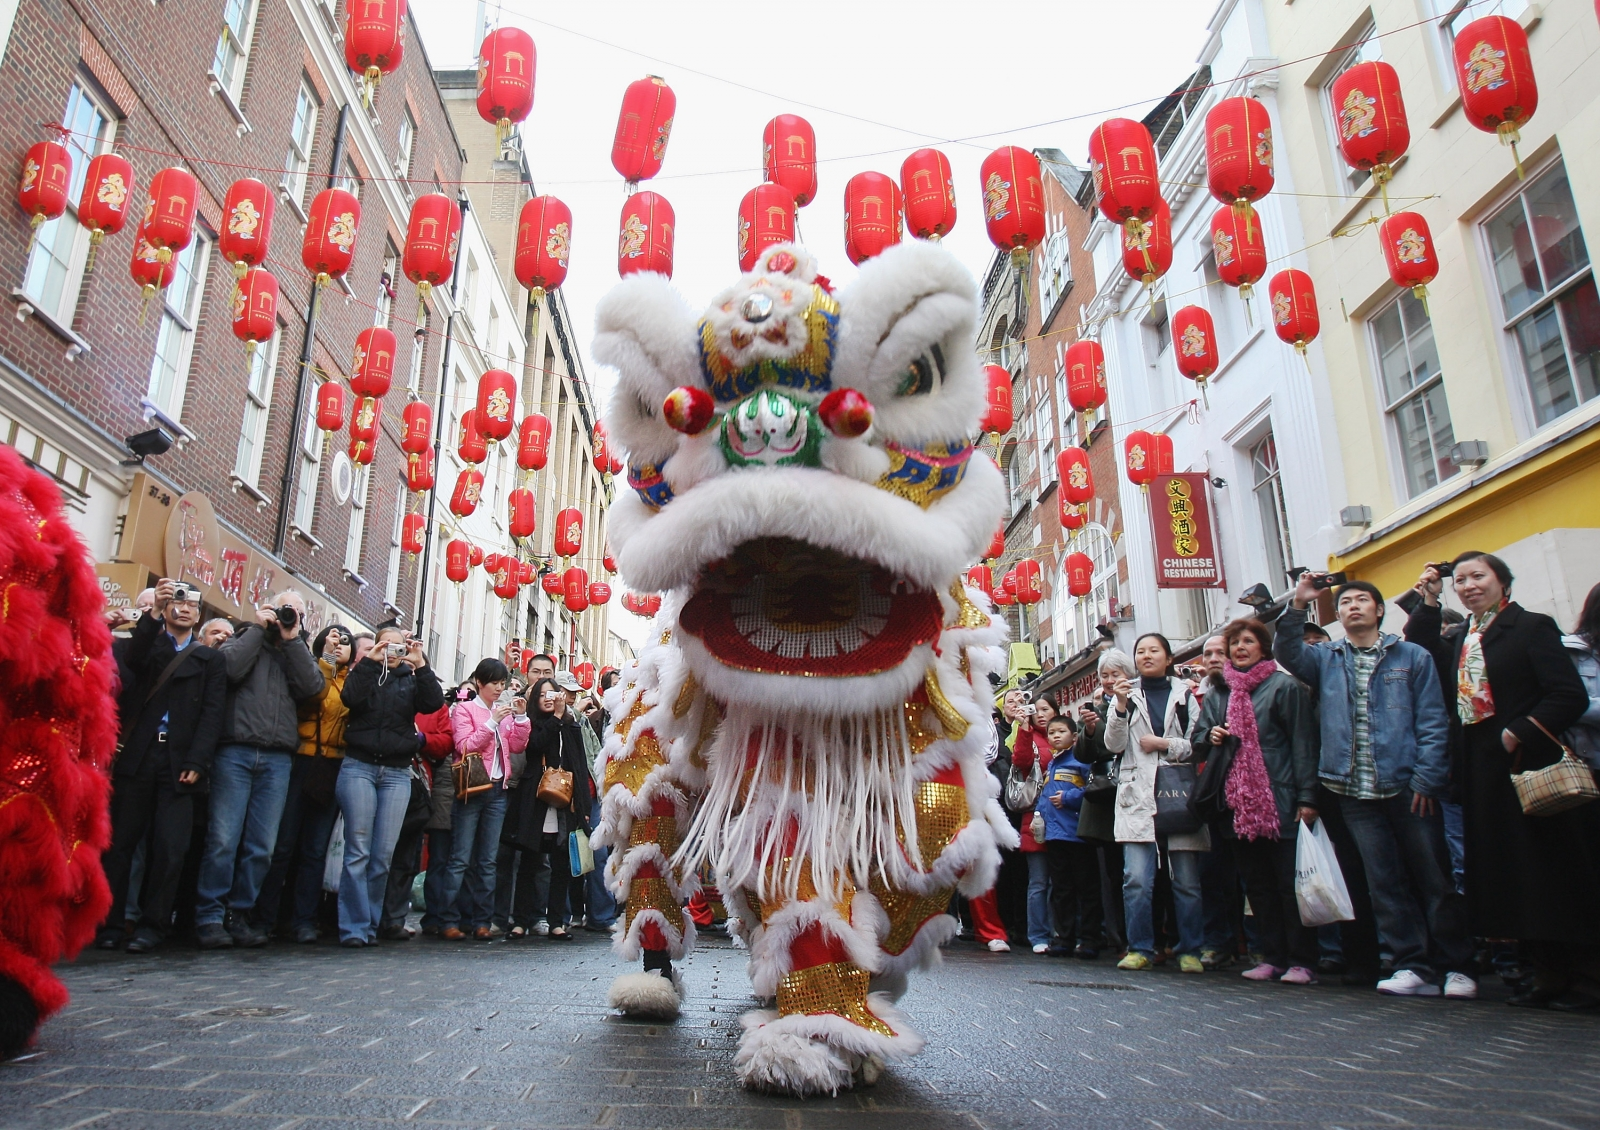 chinese new year 2015 events around the uk to celebrate the year of the goat - Chinese New Year Images 2015